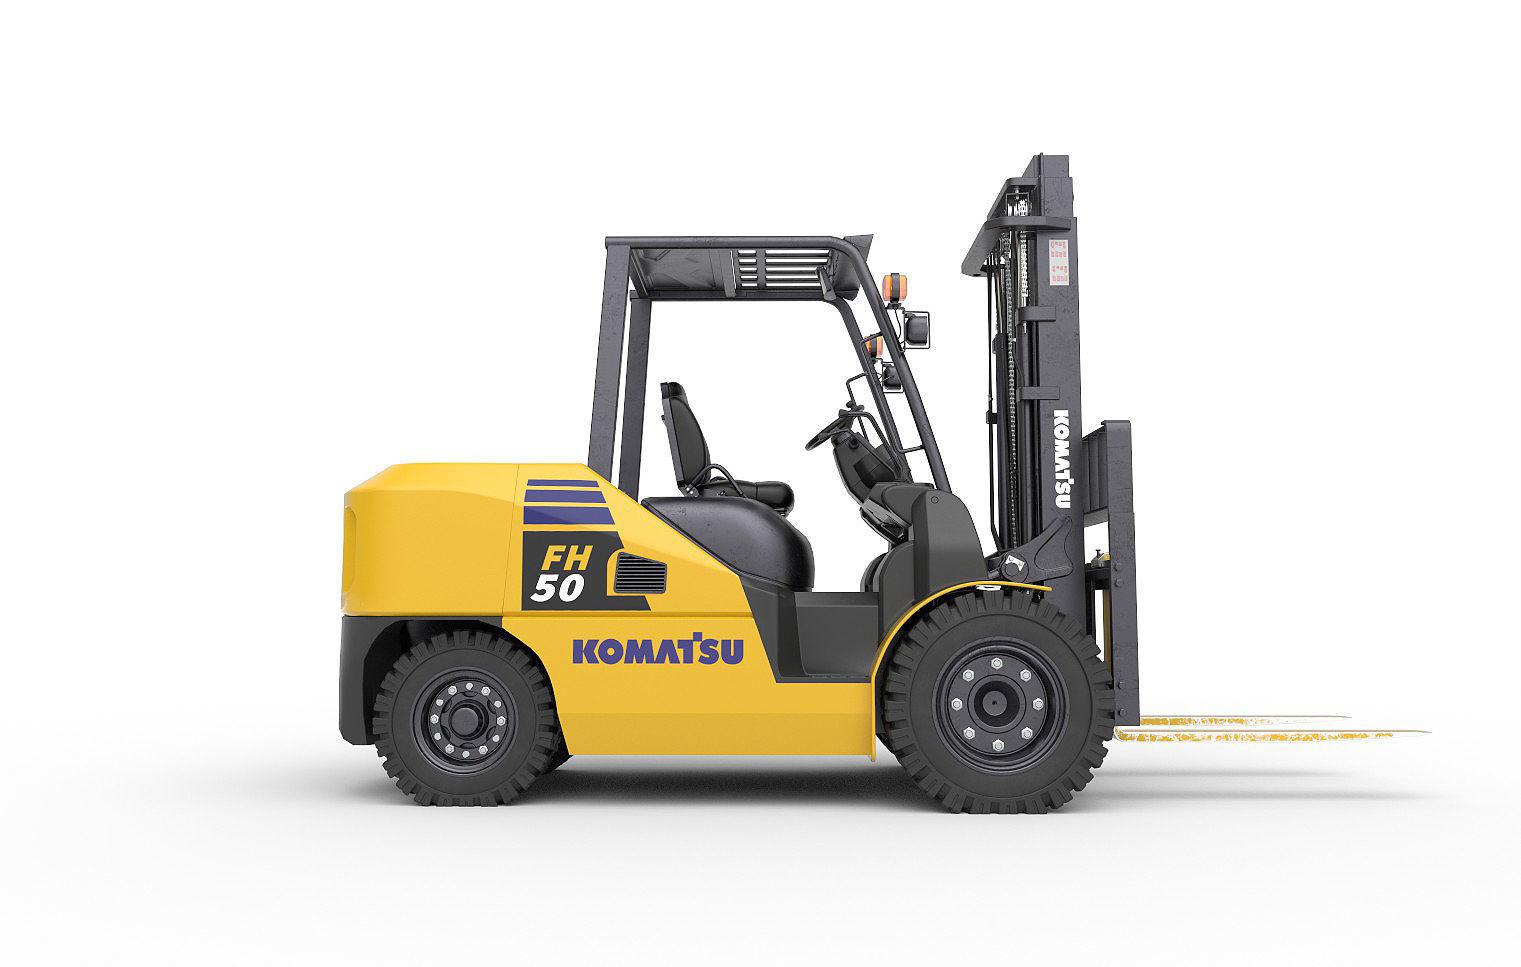 Forklift FH50 Komatsu